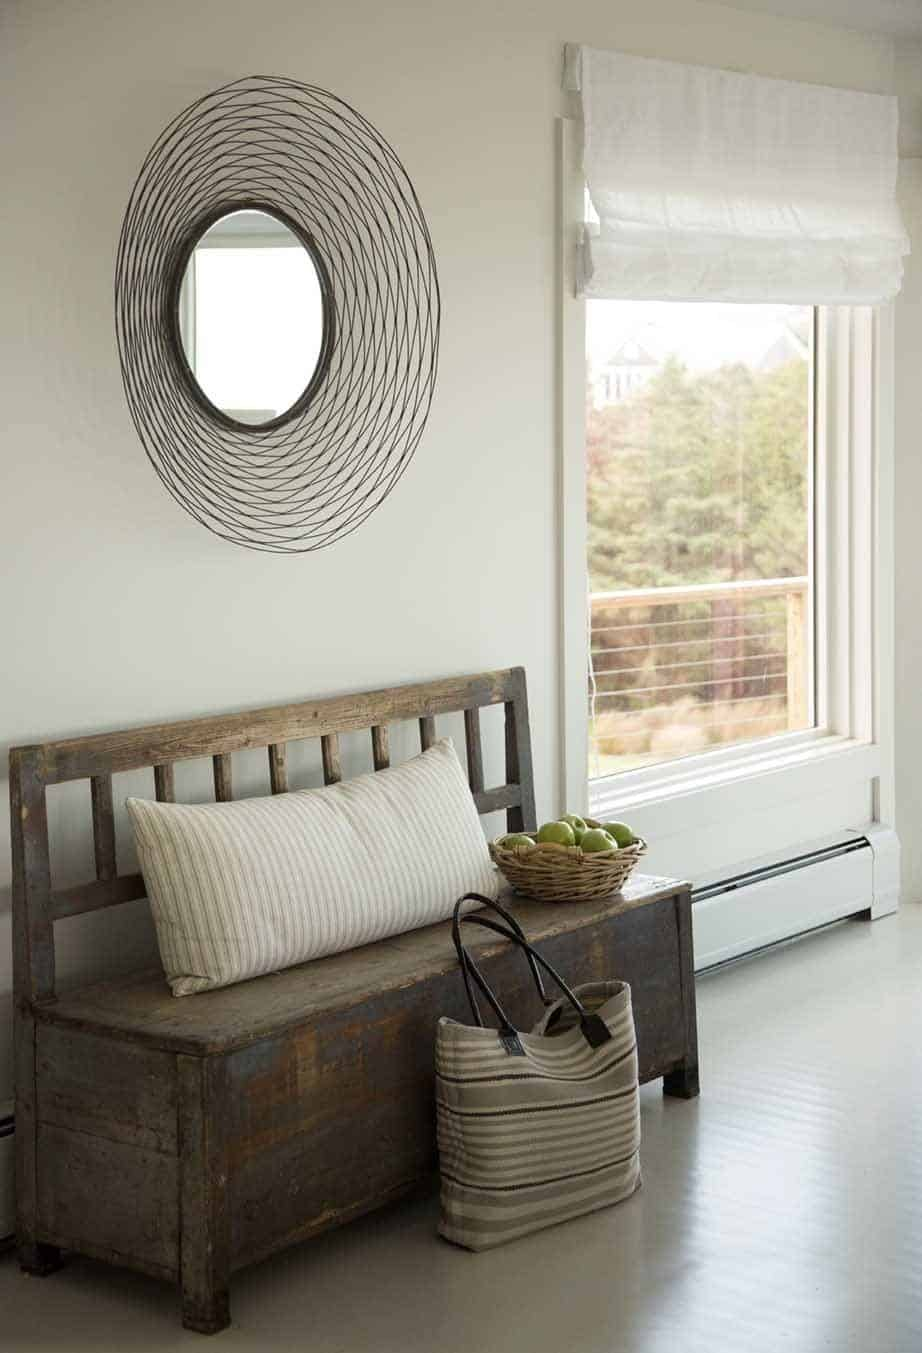 Stonewall Beach House-Marthas Vineyard Interior Design-09-1 Kindesign